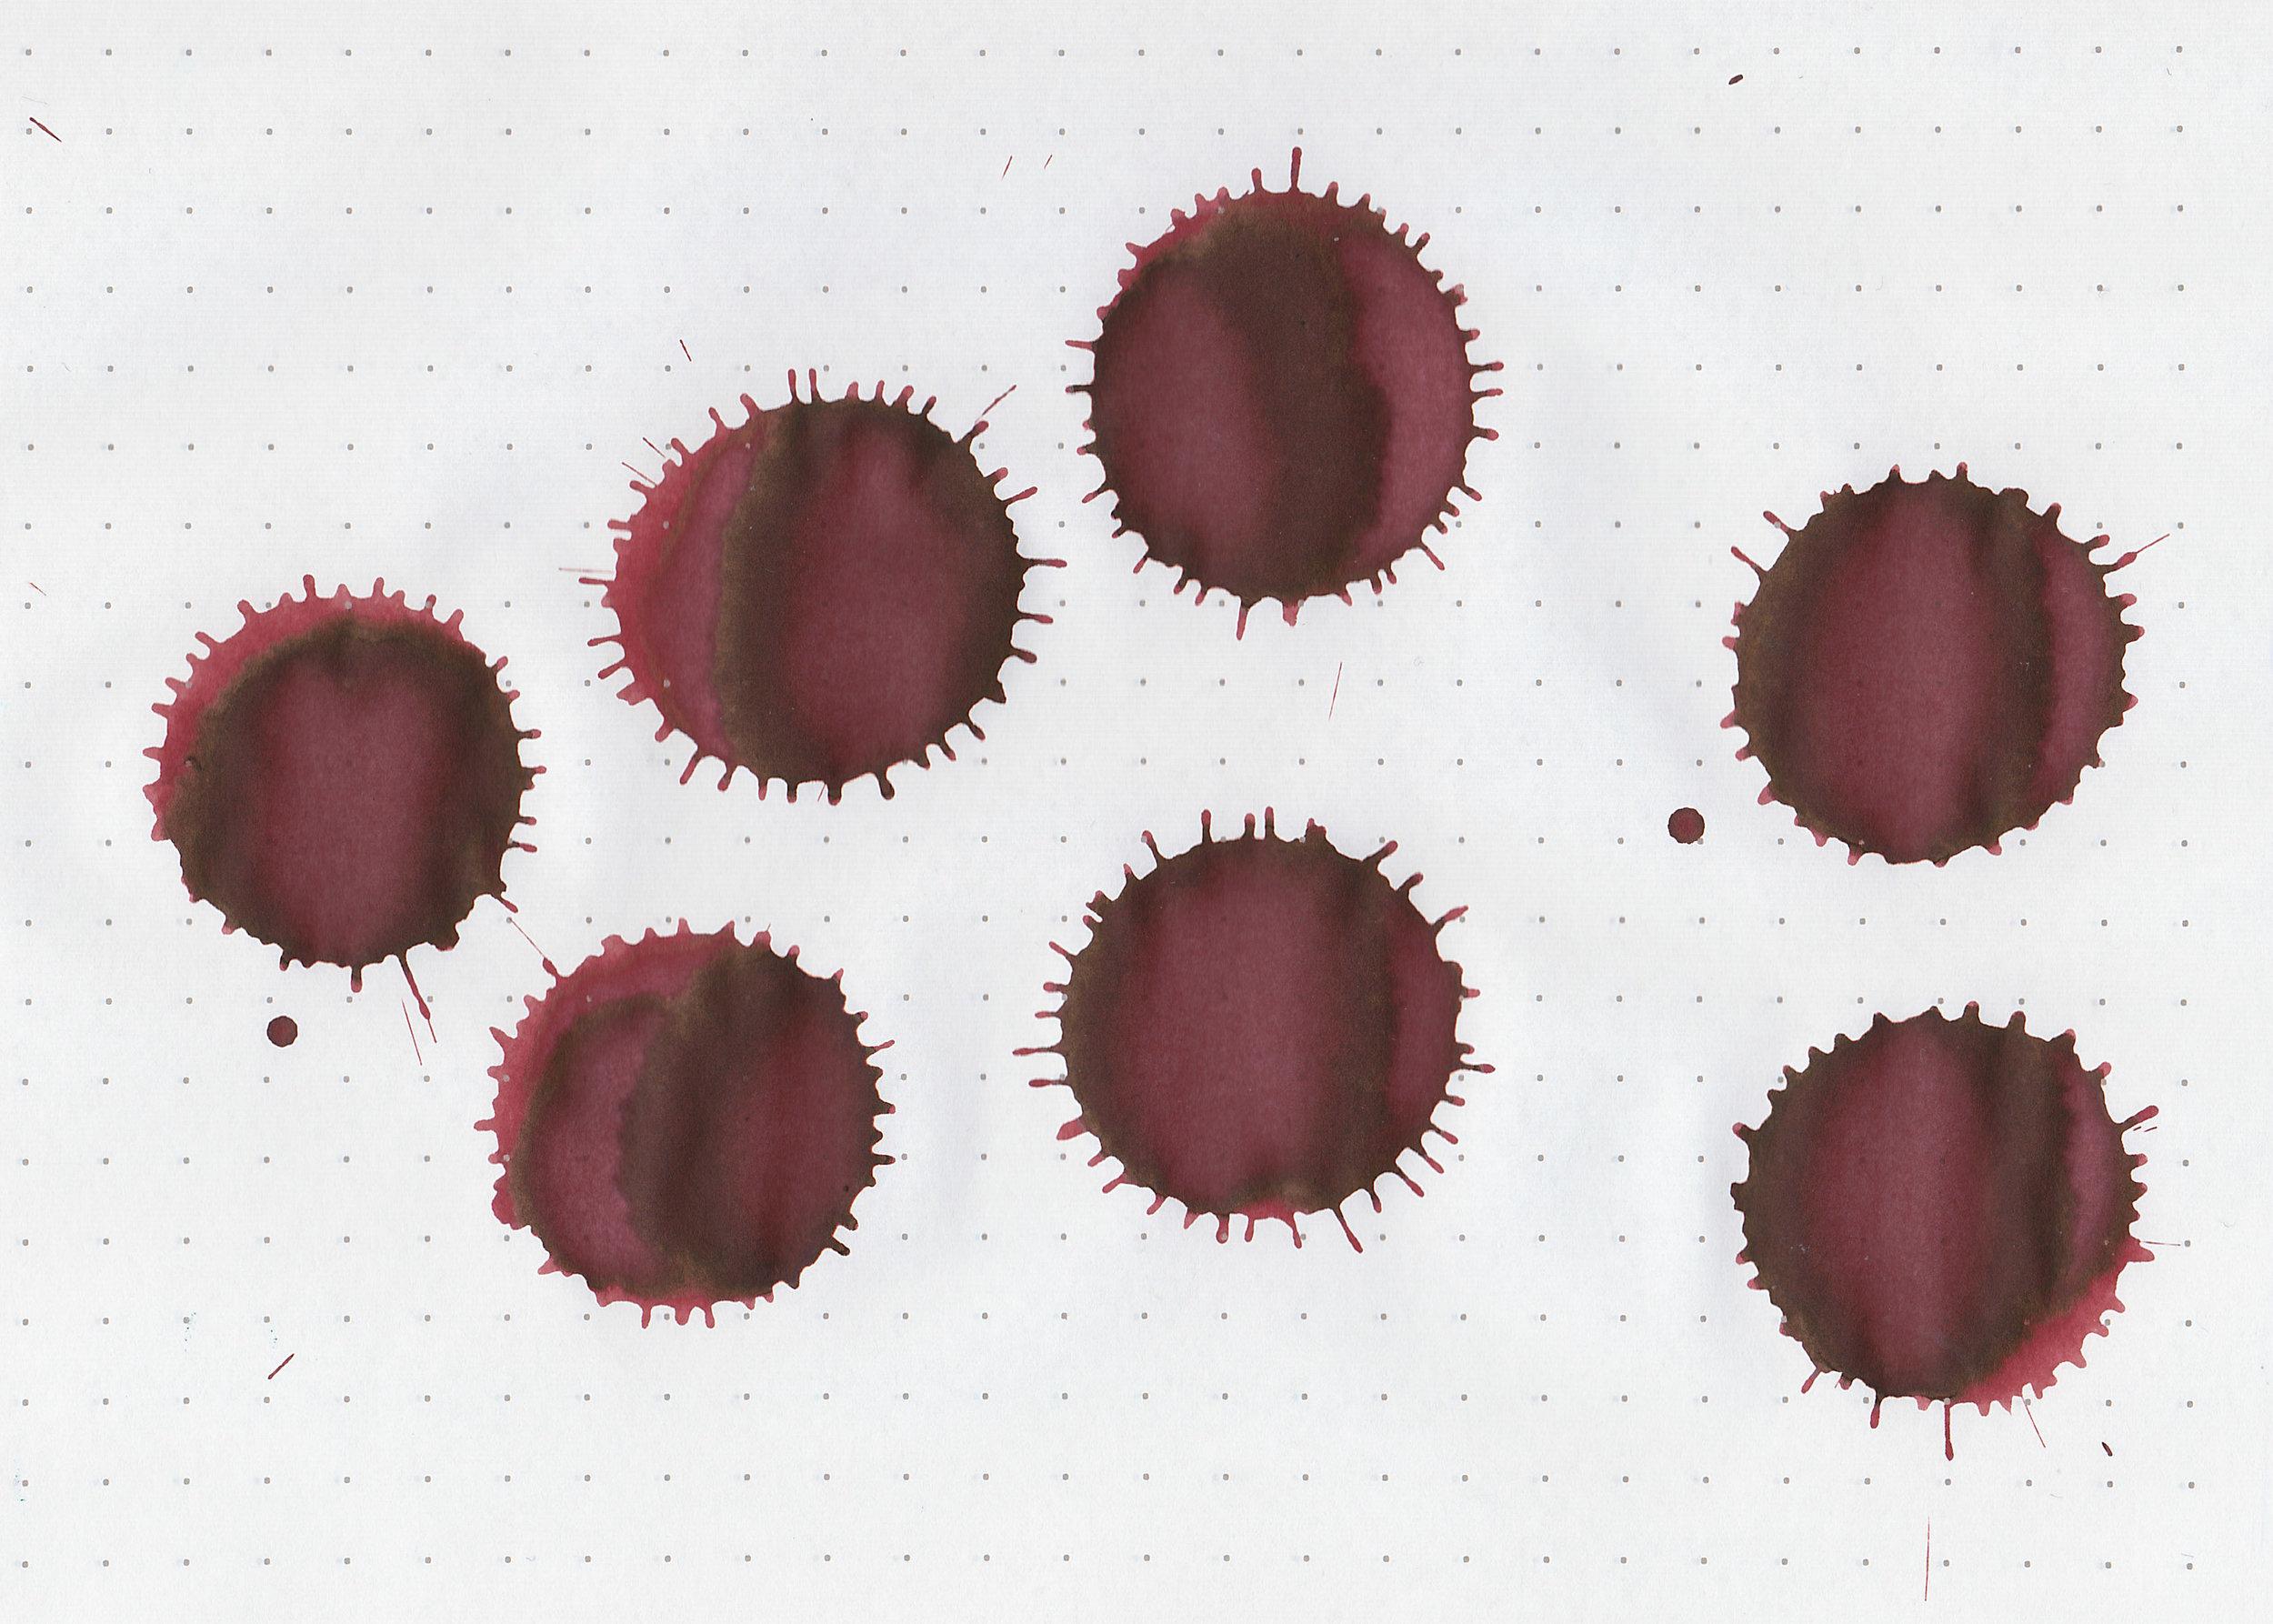 akk-7-rembrandt-12.jpg